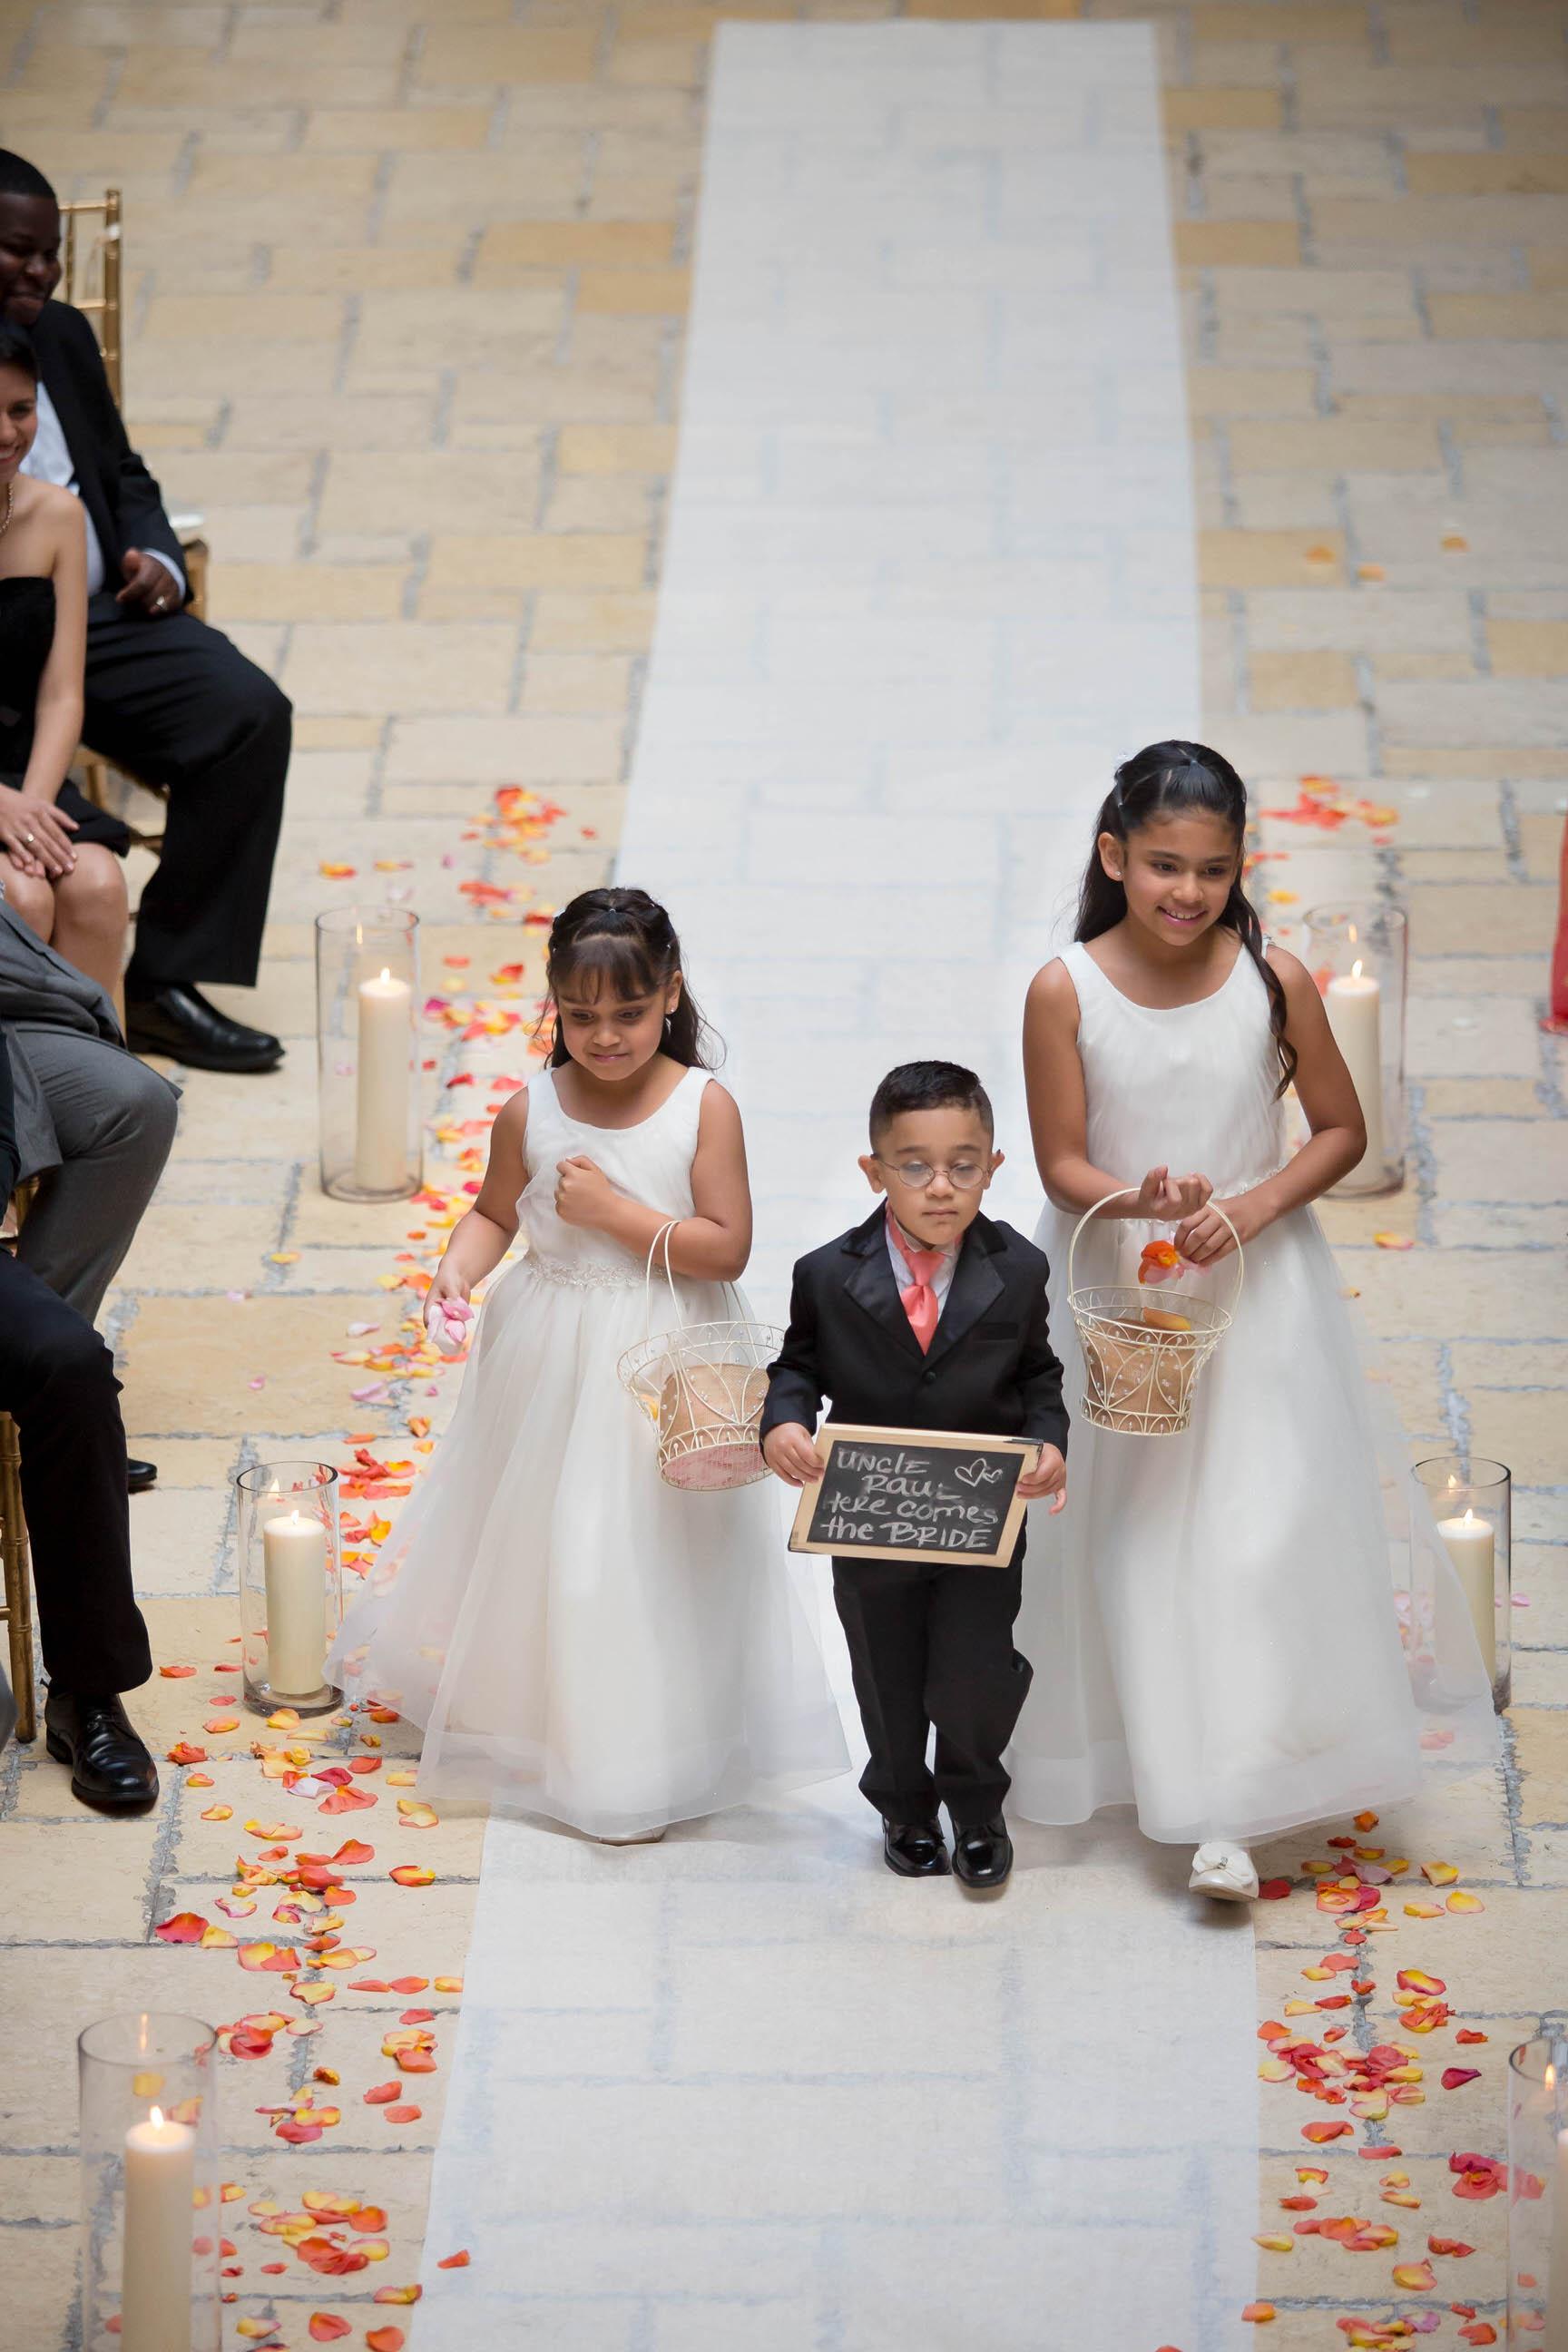 kids-at-weddings-tiny-house-photo-adorable-luxury-miami-weding-photographer.jpg